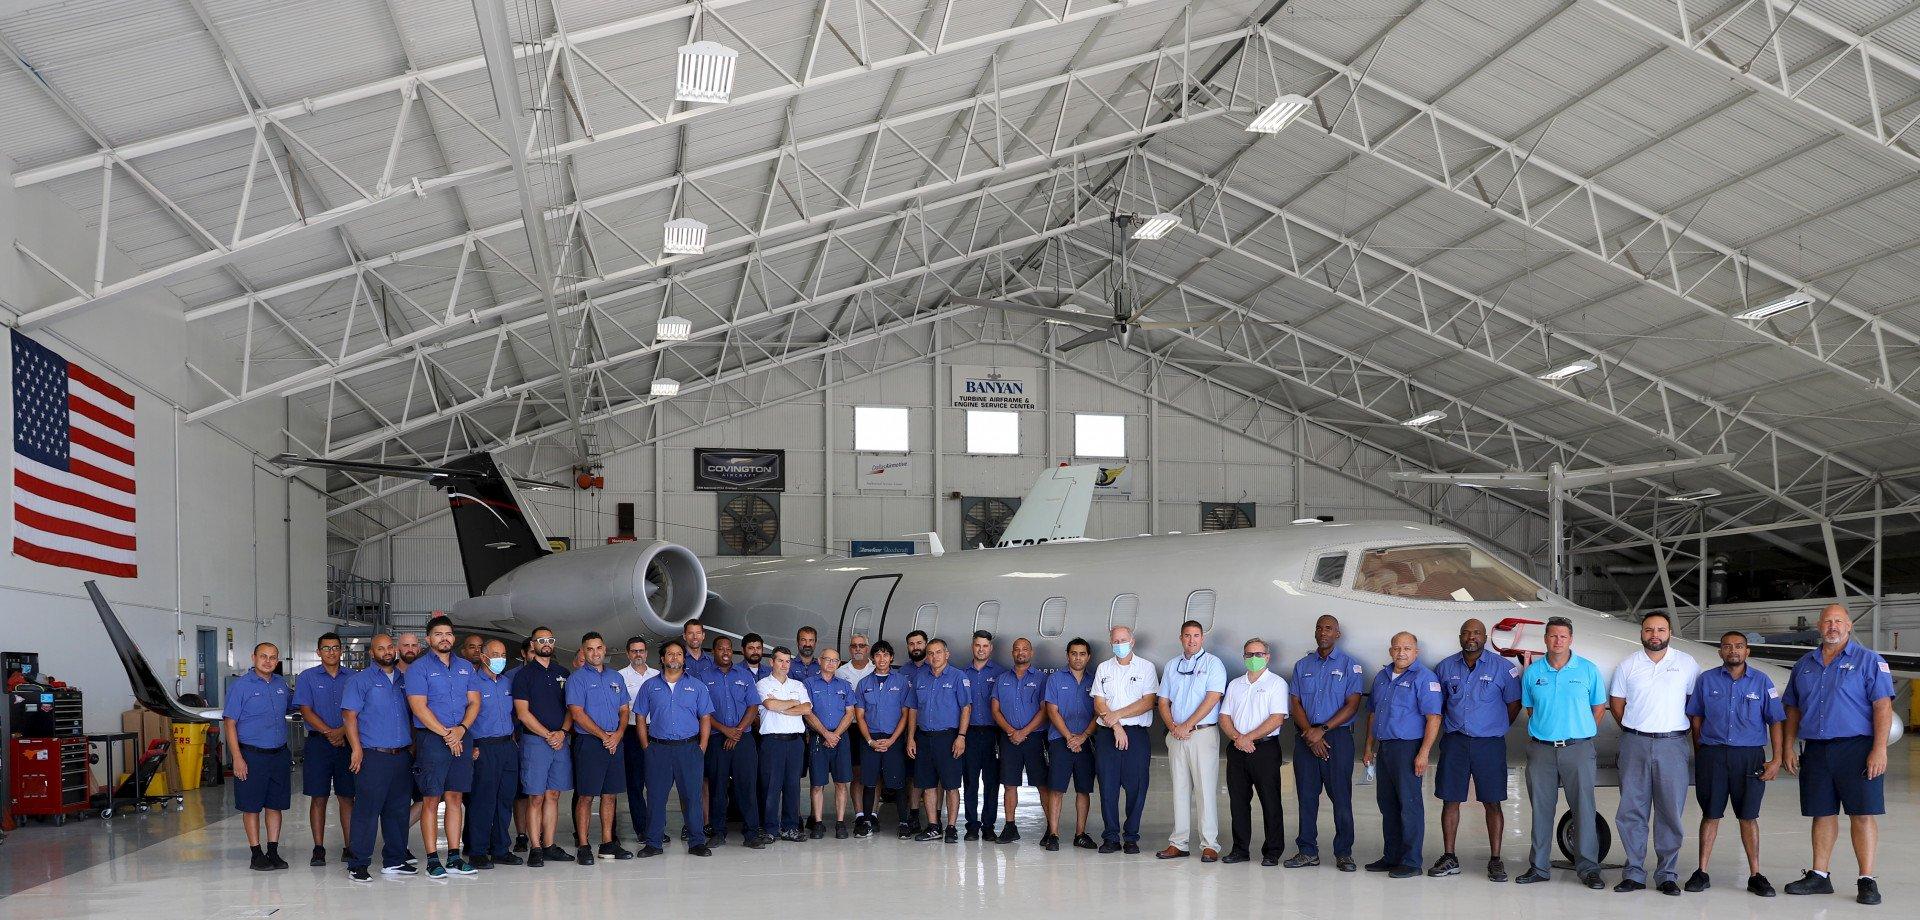 Airplane hangar for hurricane